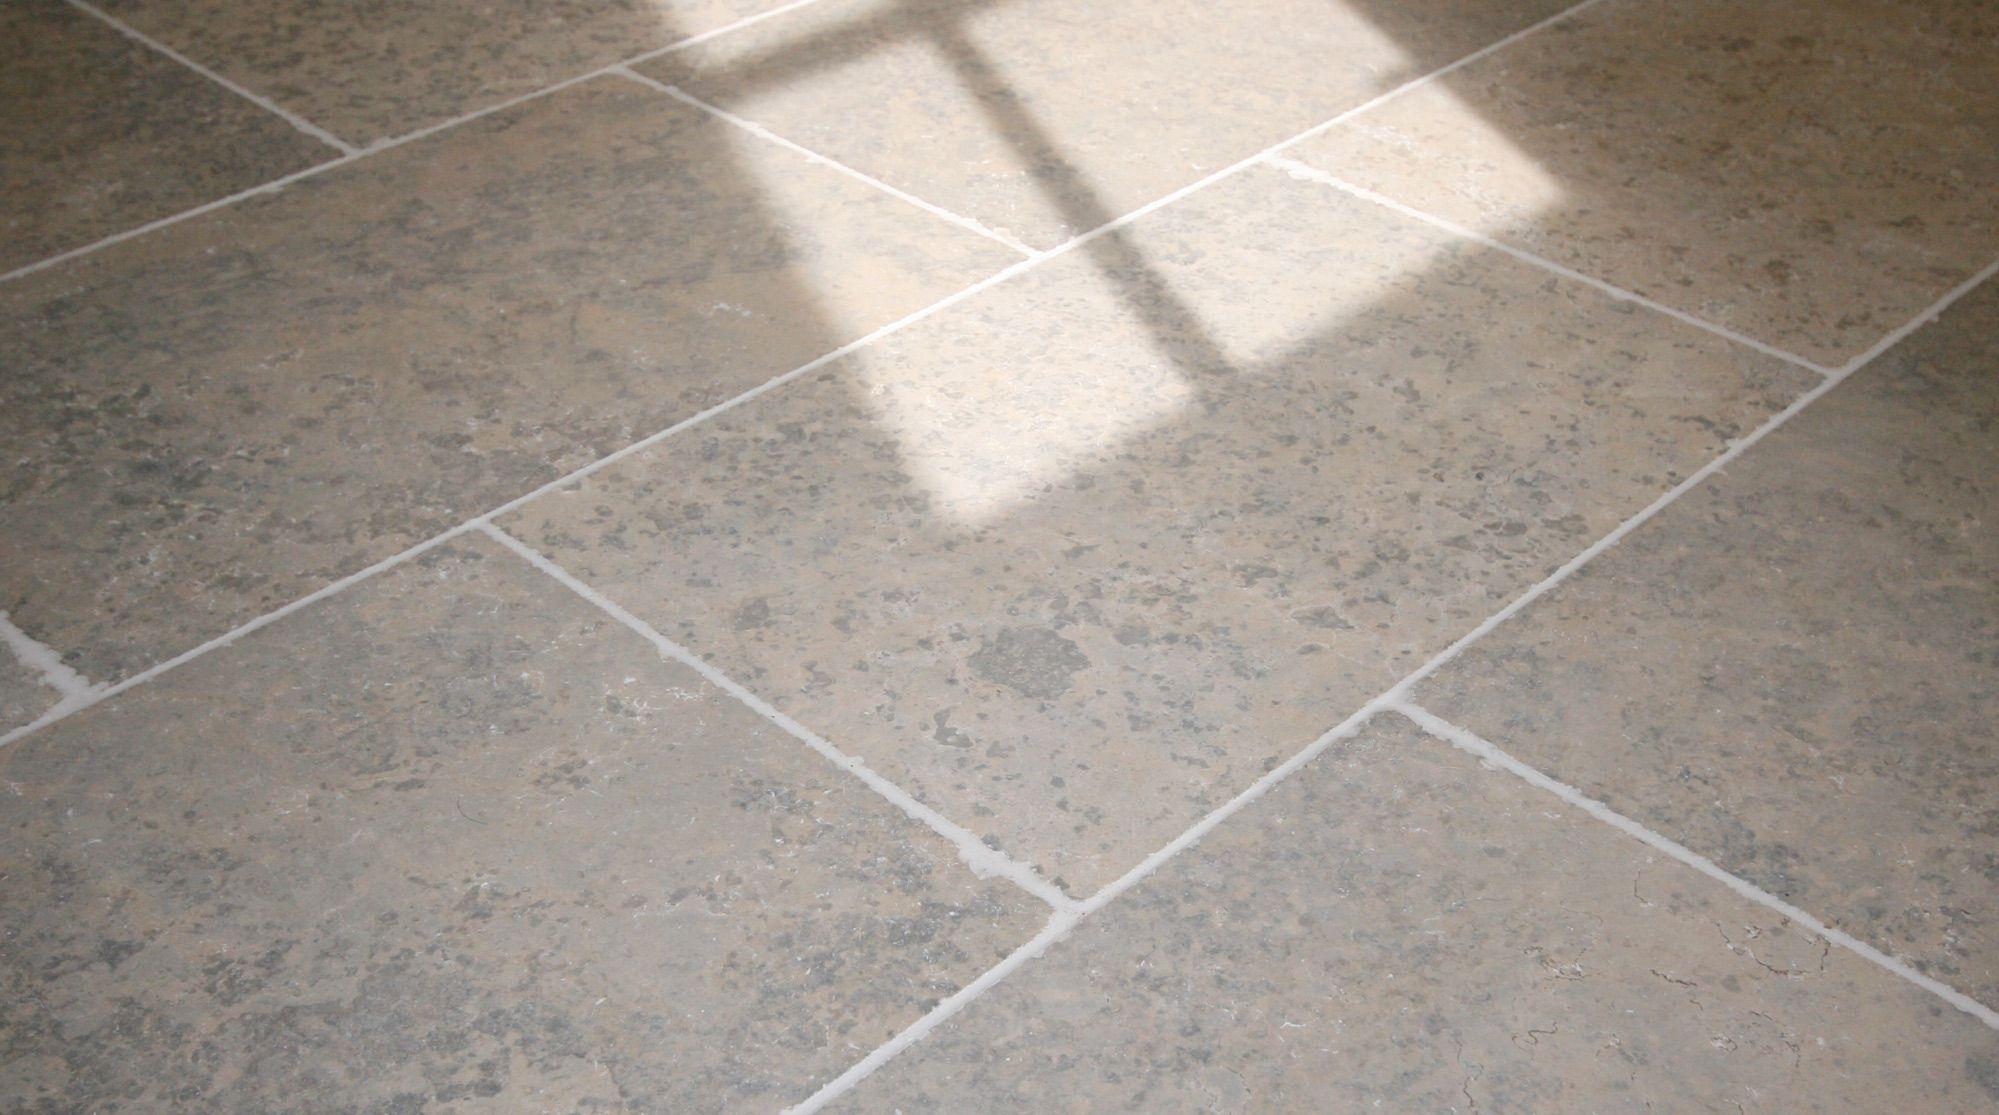 Pula blue tumbled limestone floor tiles mystonefloor pula blue tumbled limestone floor tiles mystonefloor doublecrazyfo Image collections